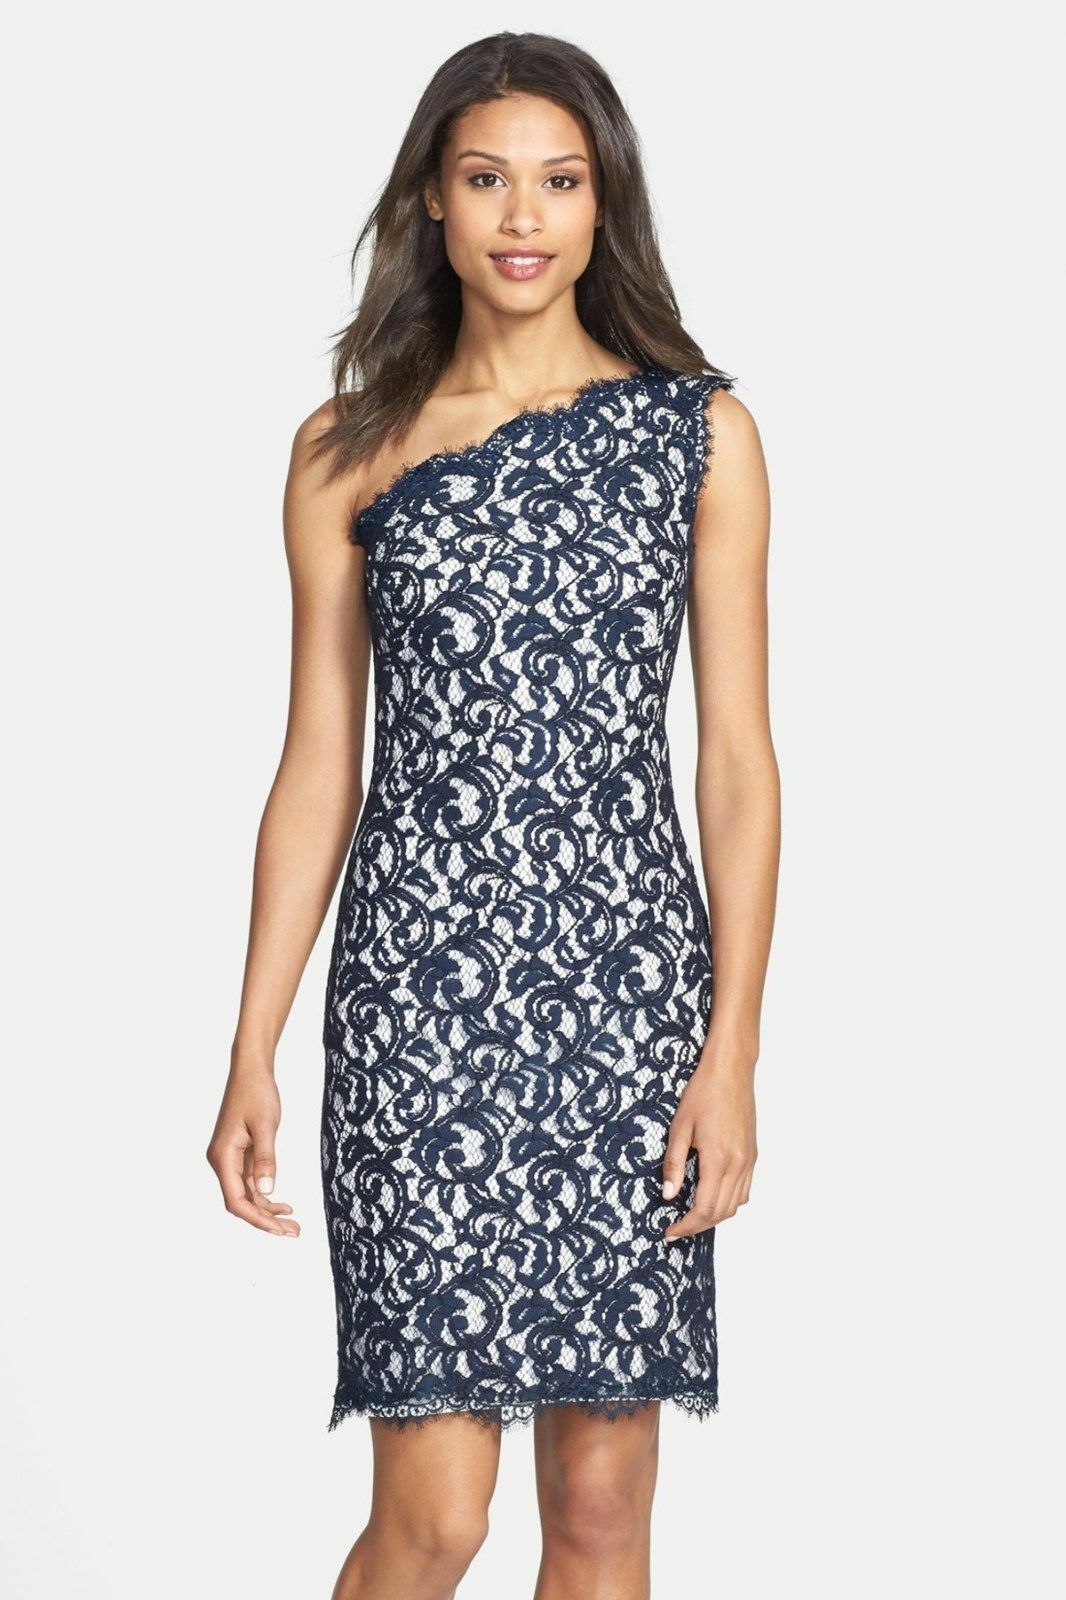 TADASHI SHOJI One-Shoulder Lace Sheath Dress NAVY IVORY Größe 2 NWT